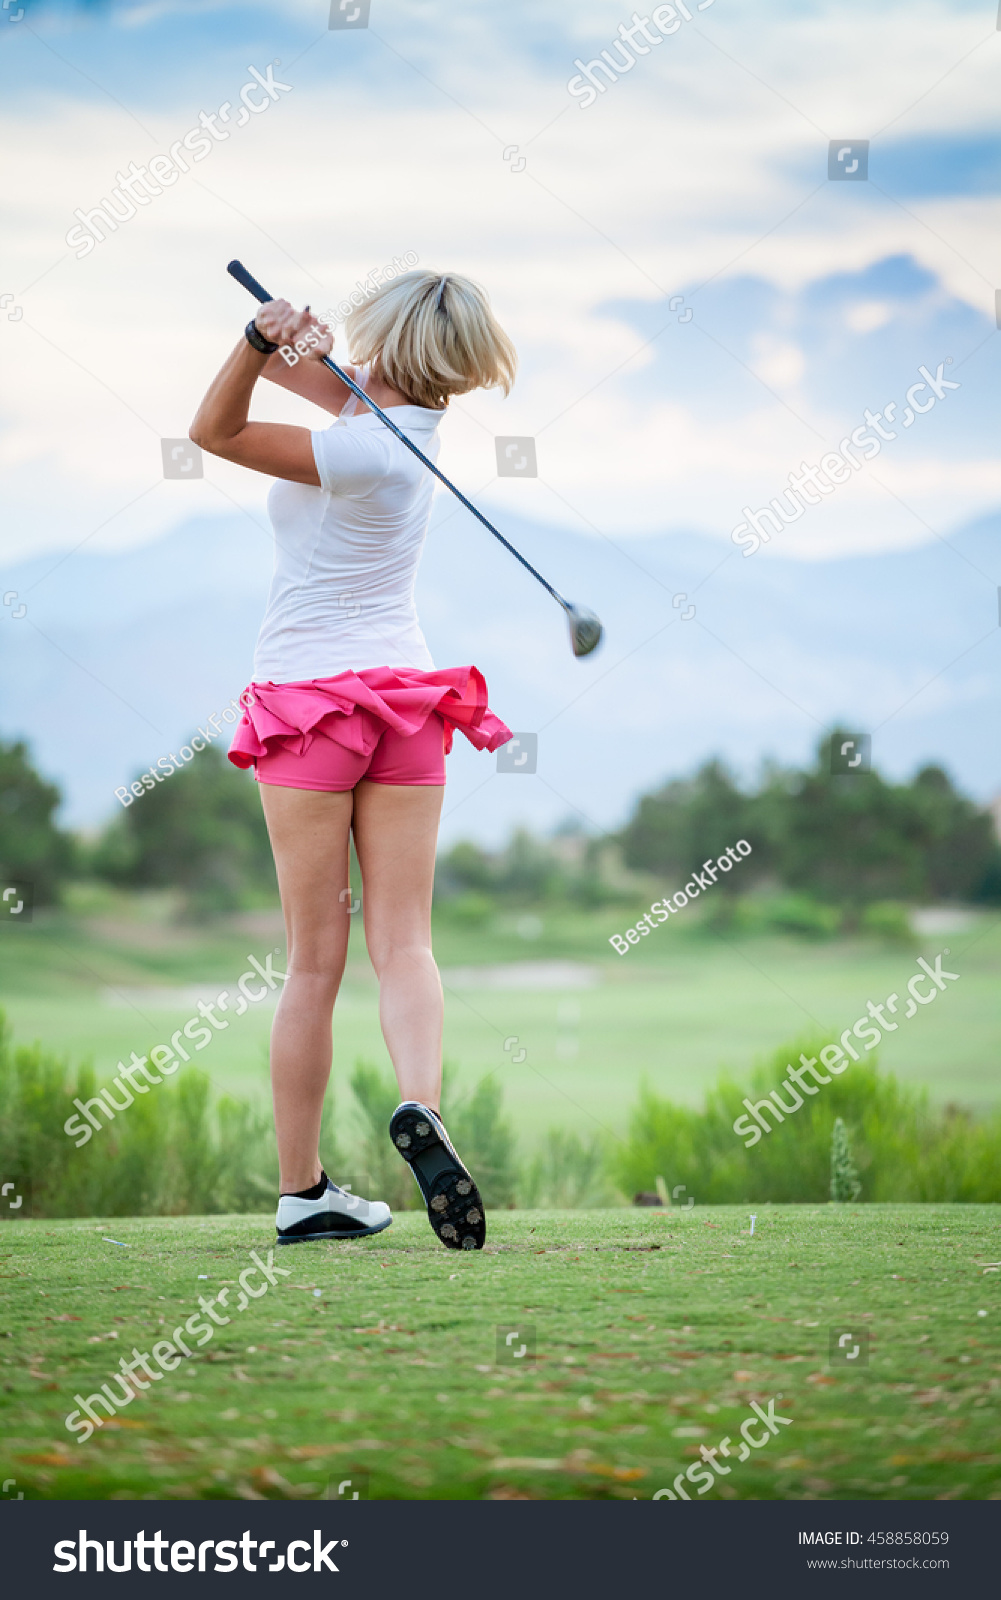 blonde female golfer swinging club on stock photo edit now